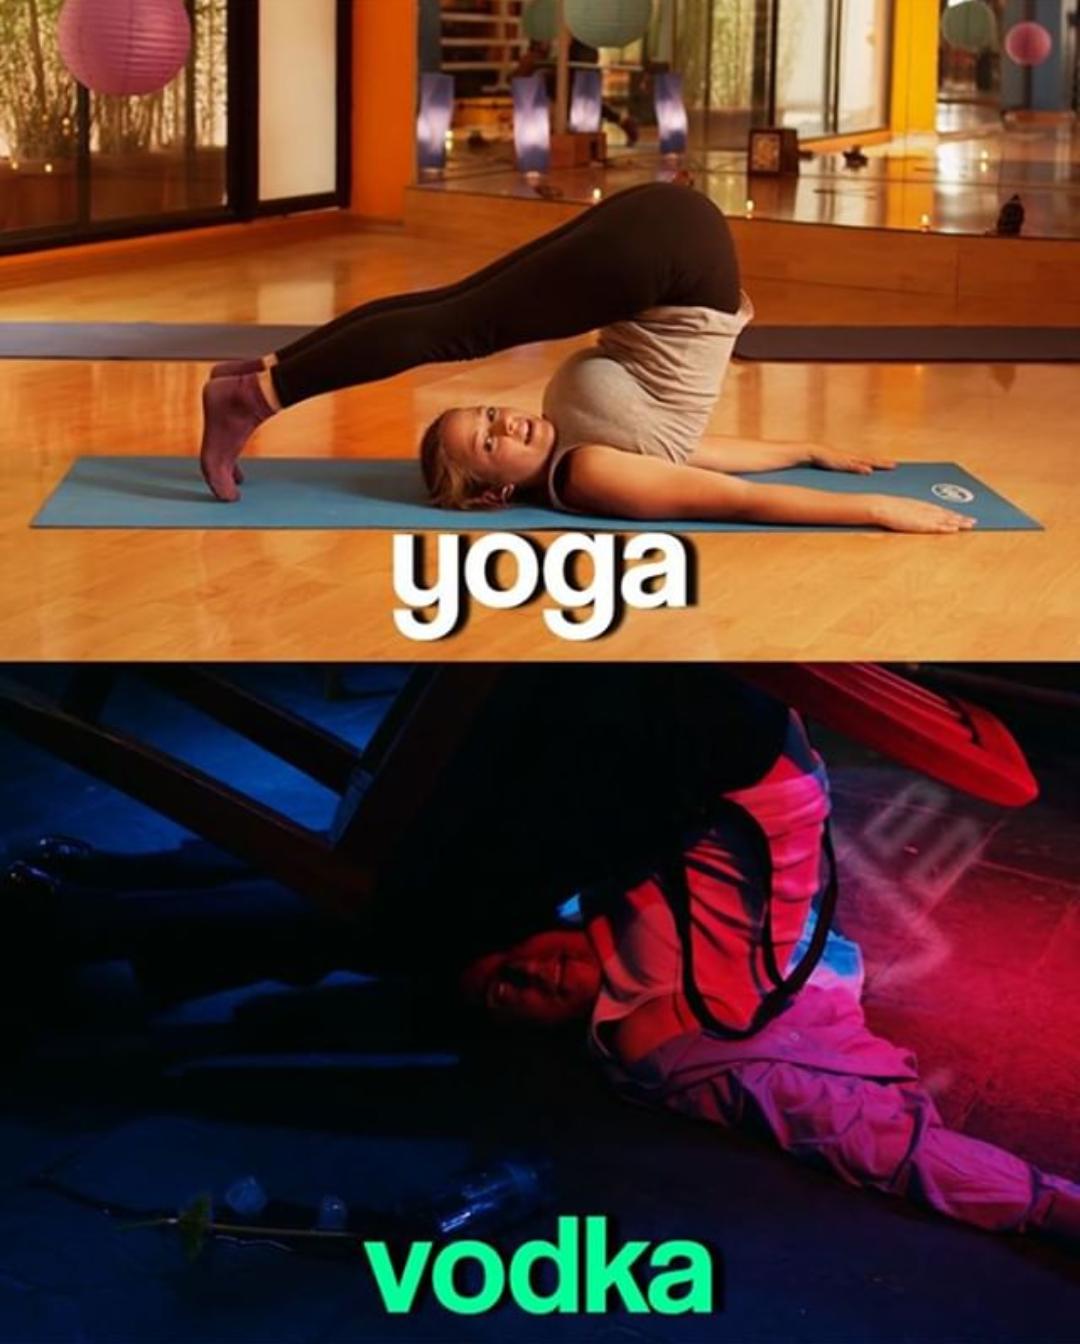 What S Sexier Than Yoga Pants A Yoga Bodysuit Nochill Z Summer 18